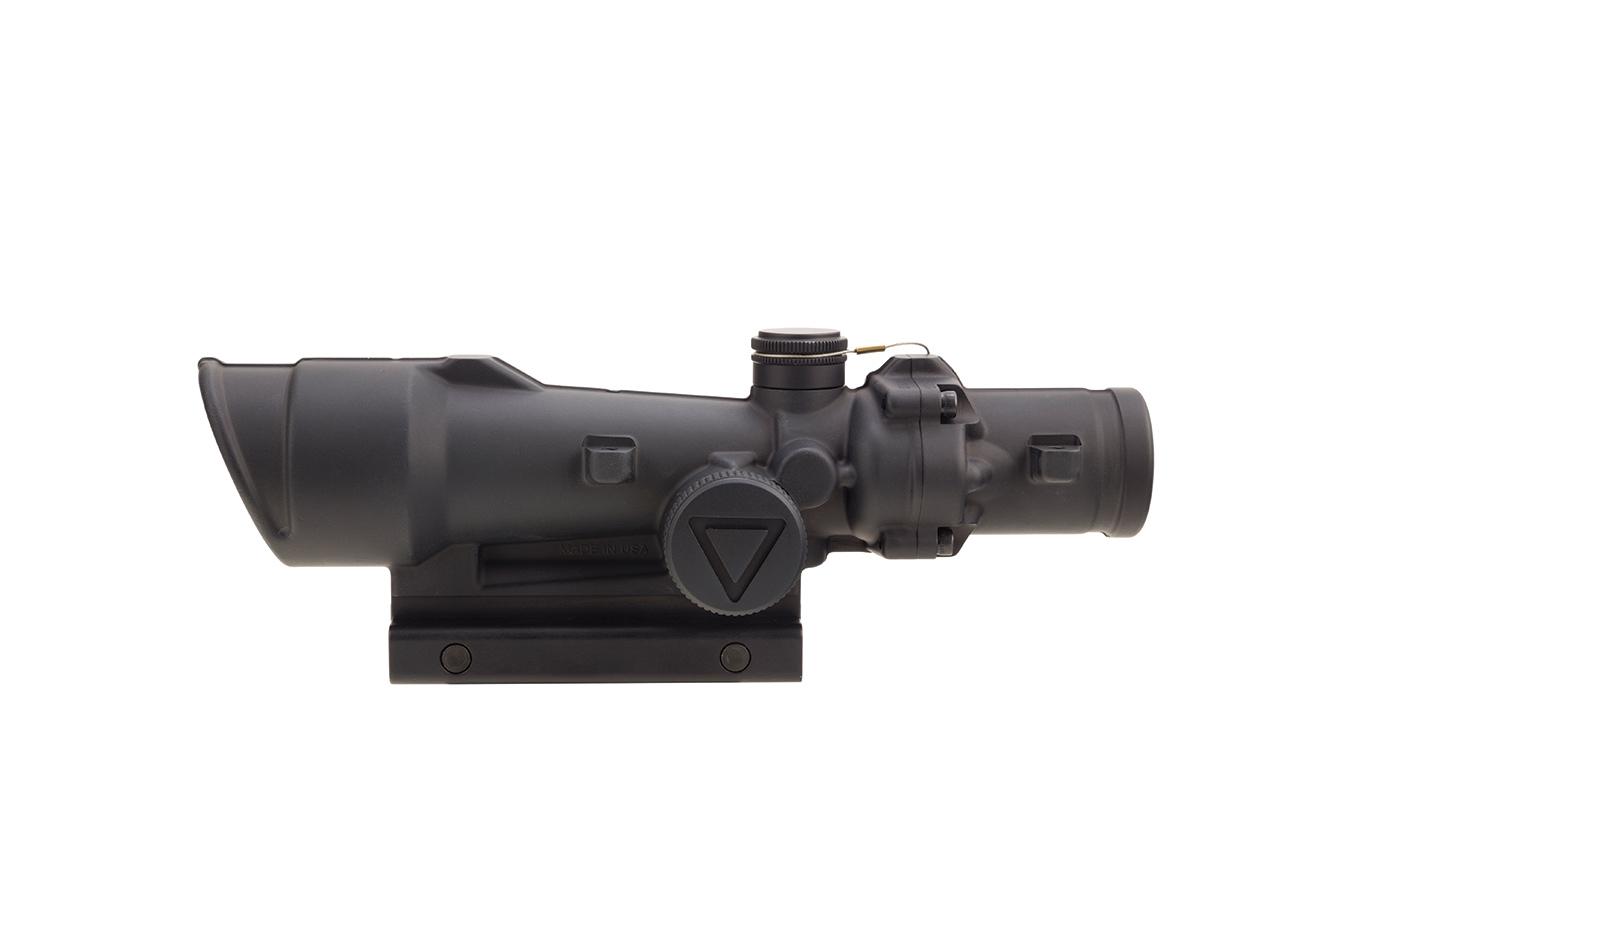 TA110-D-100499 angle 2